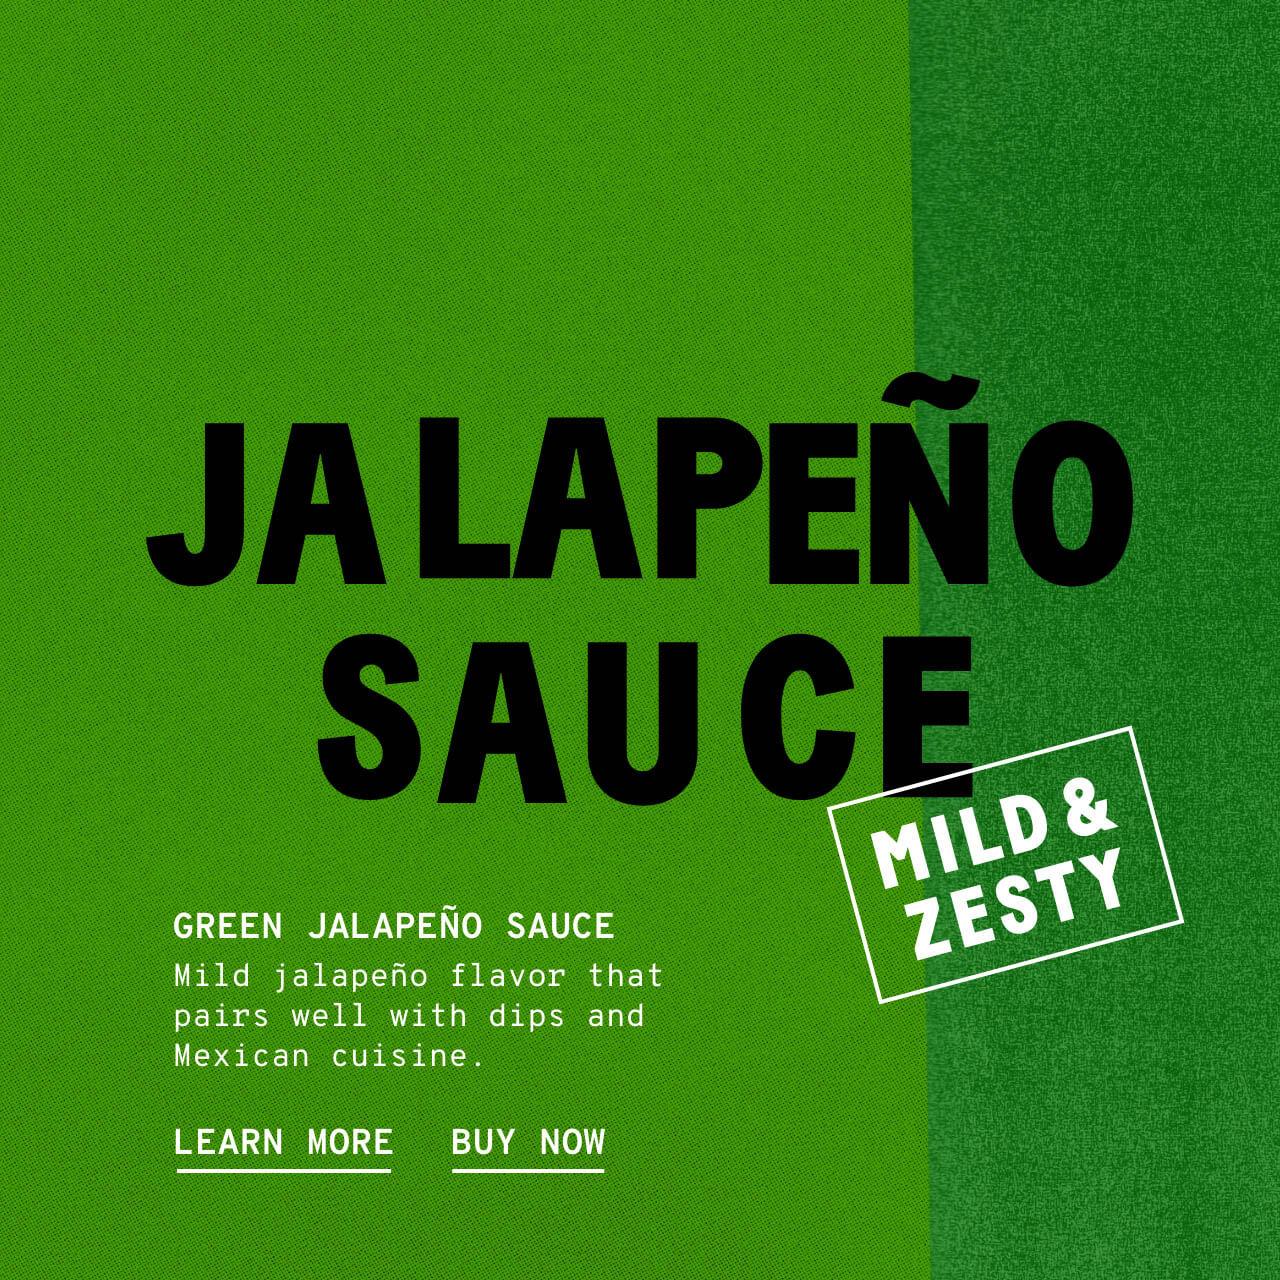 Green Jalapeno Sauce - Description